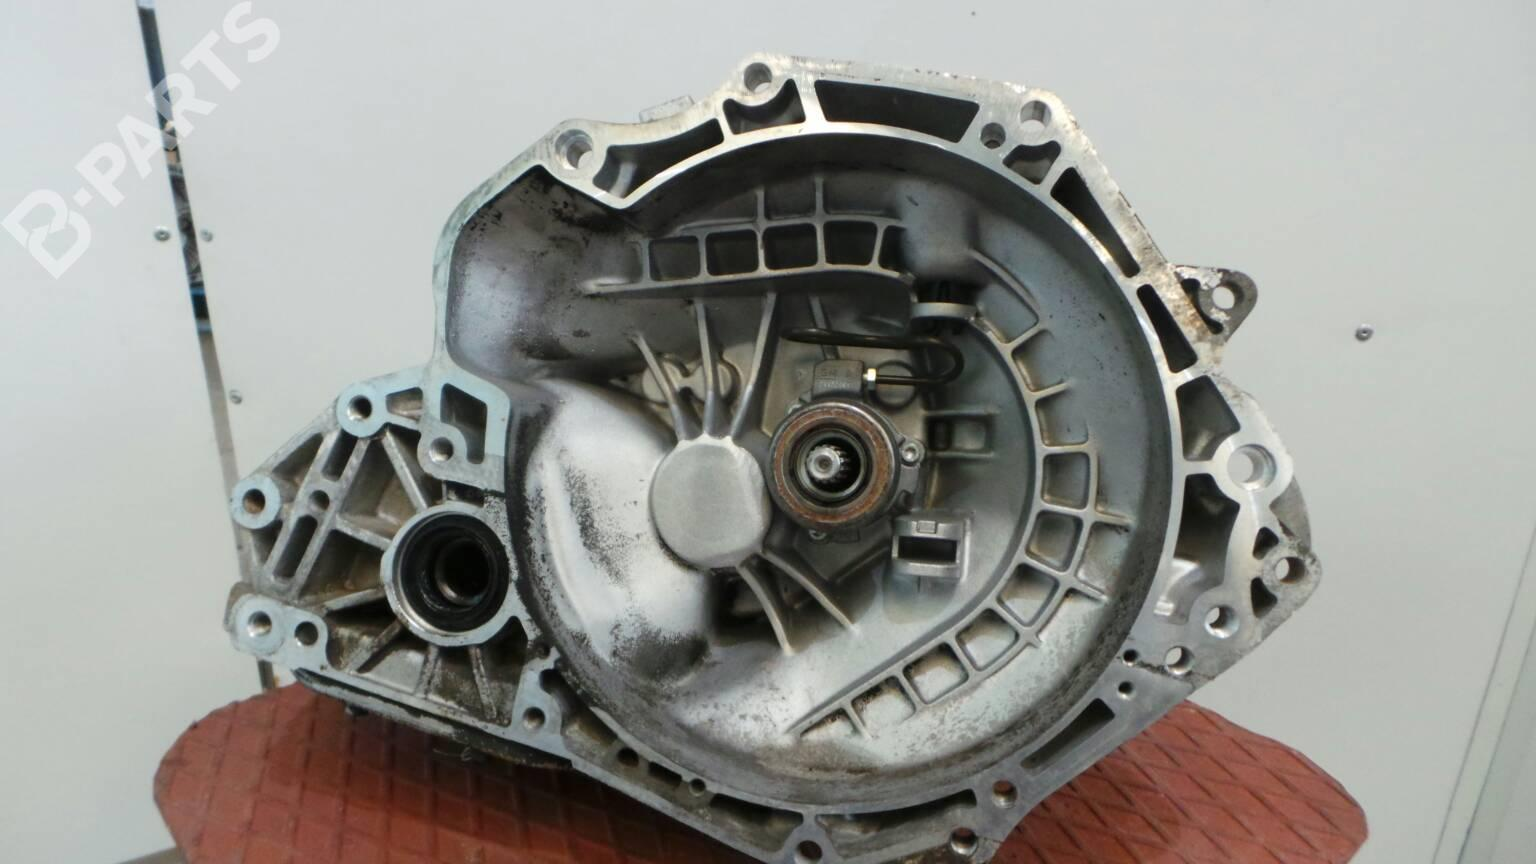 Manual Gearbox Opel Corsa C X01 17 Dti F08 F68 24107 1 7 Wiring Diagram 90400209 300193851